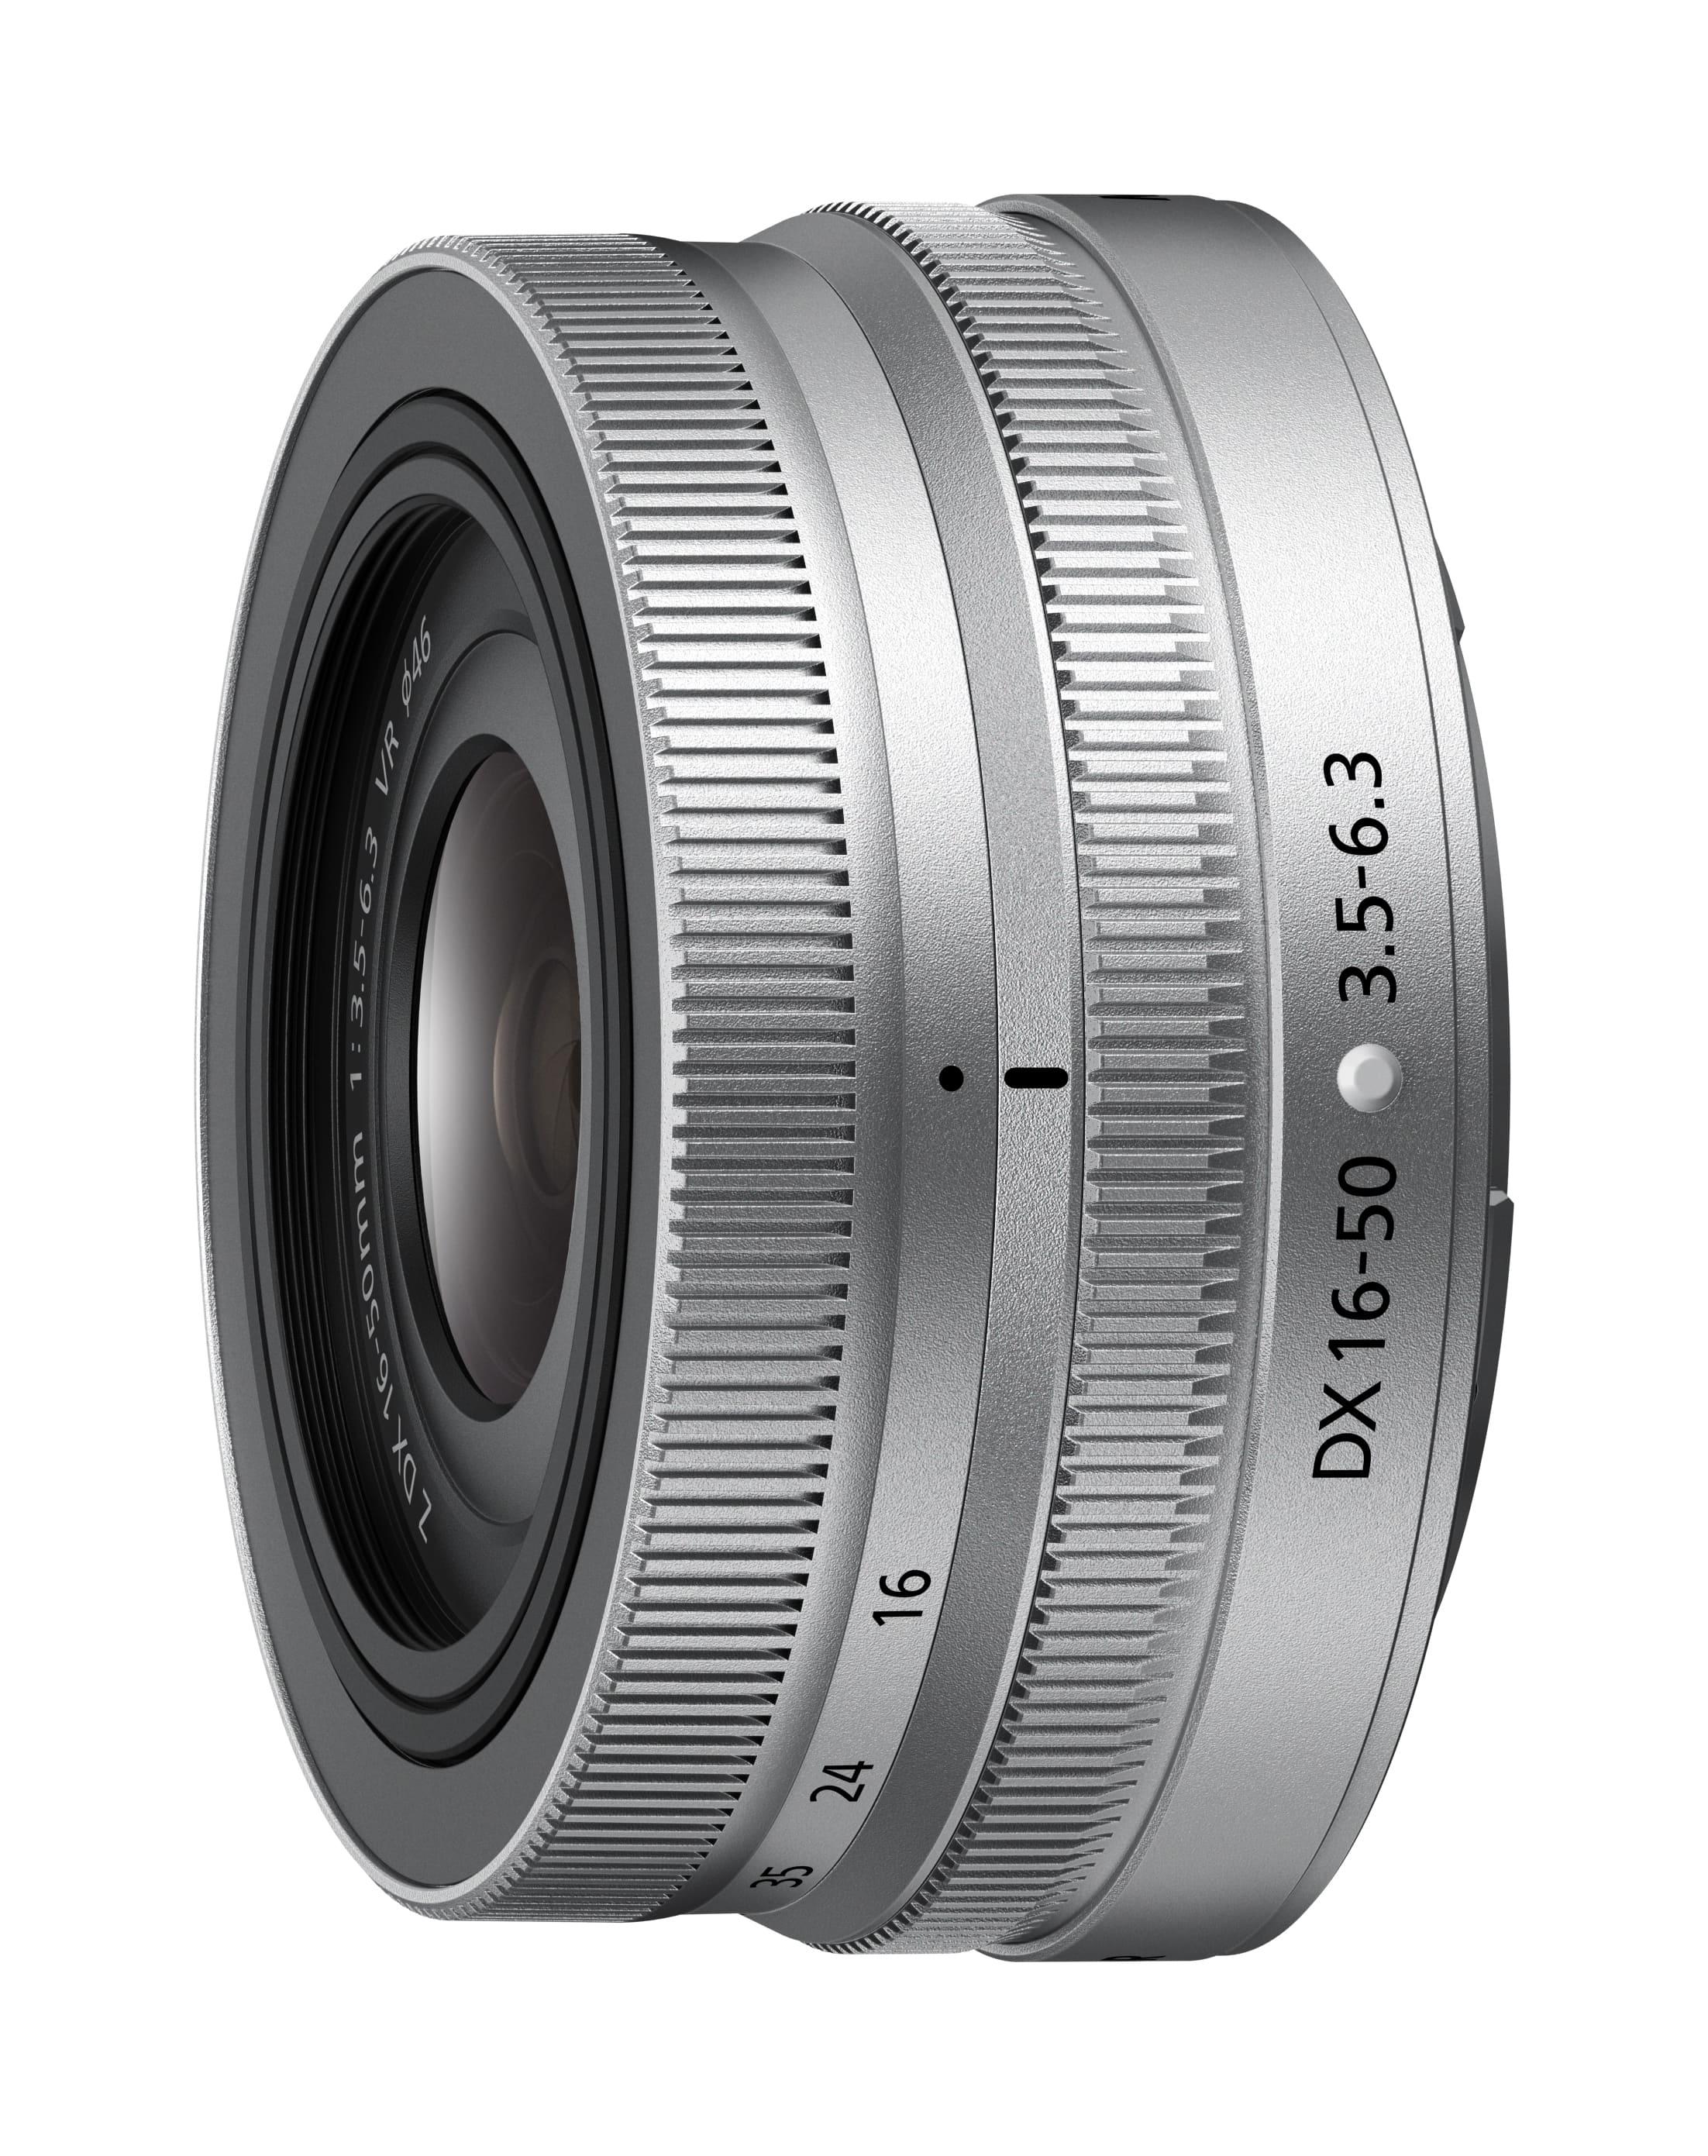 Nikon NIKKOR Z DX 16-50mm 1:3.5-6.3 VR  Silver Edition